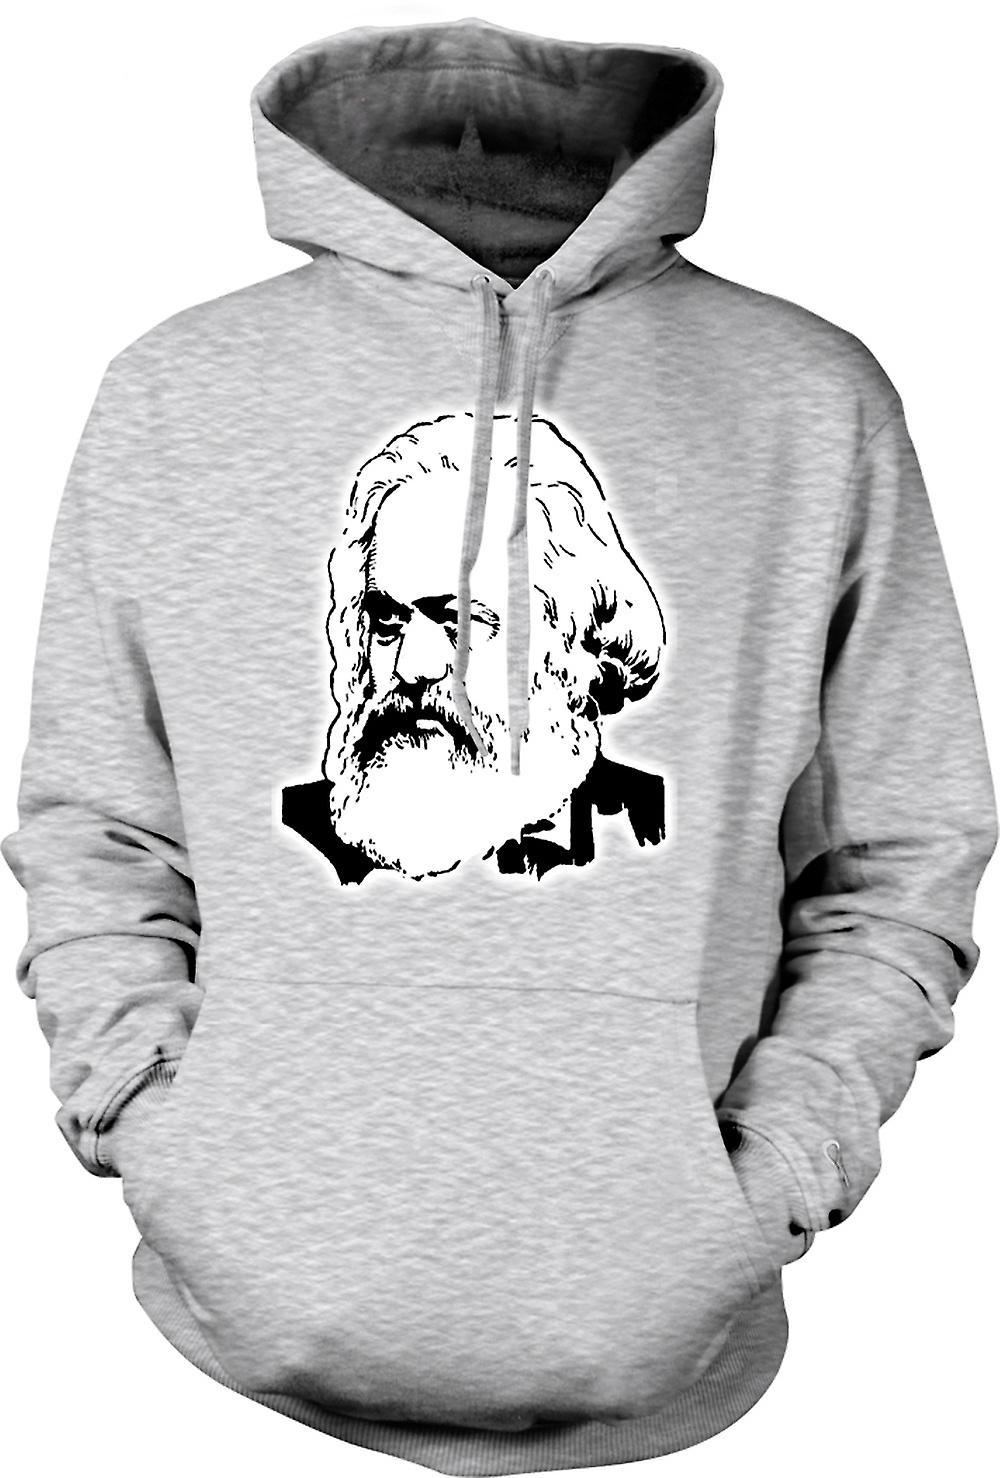 Mens Hoodie - Karl Marx - Icon